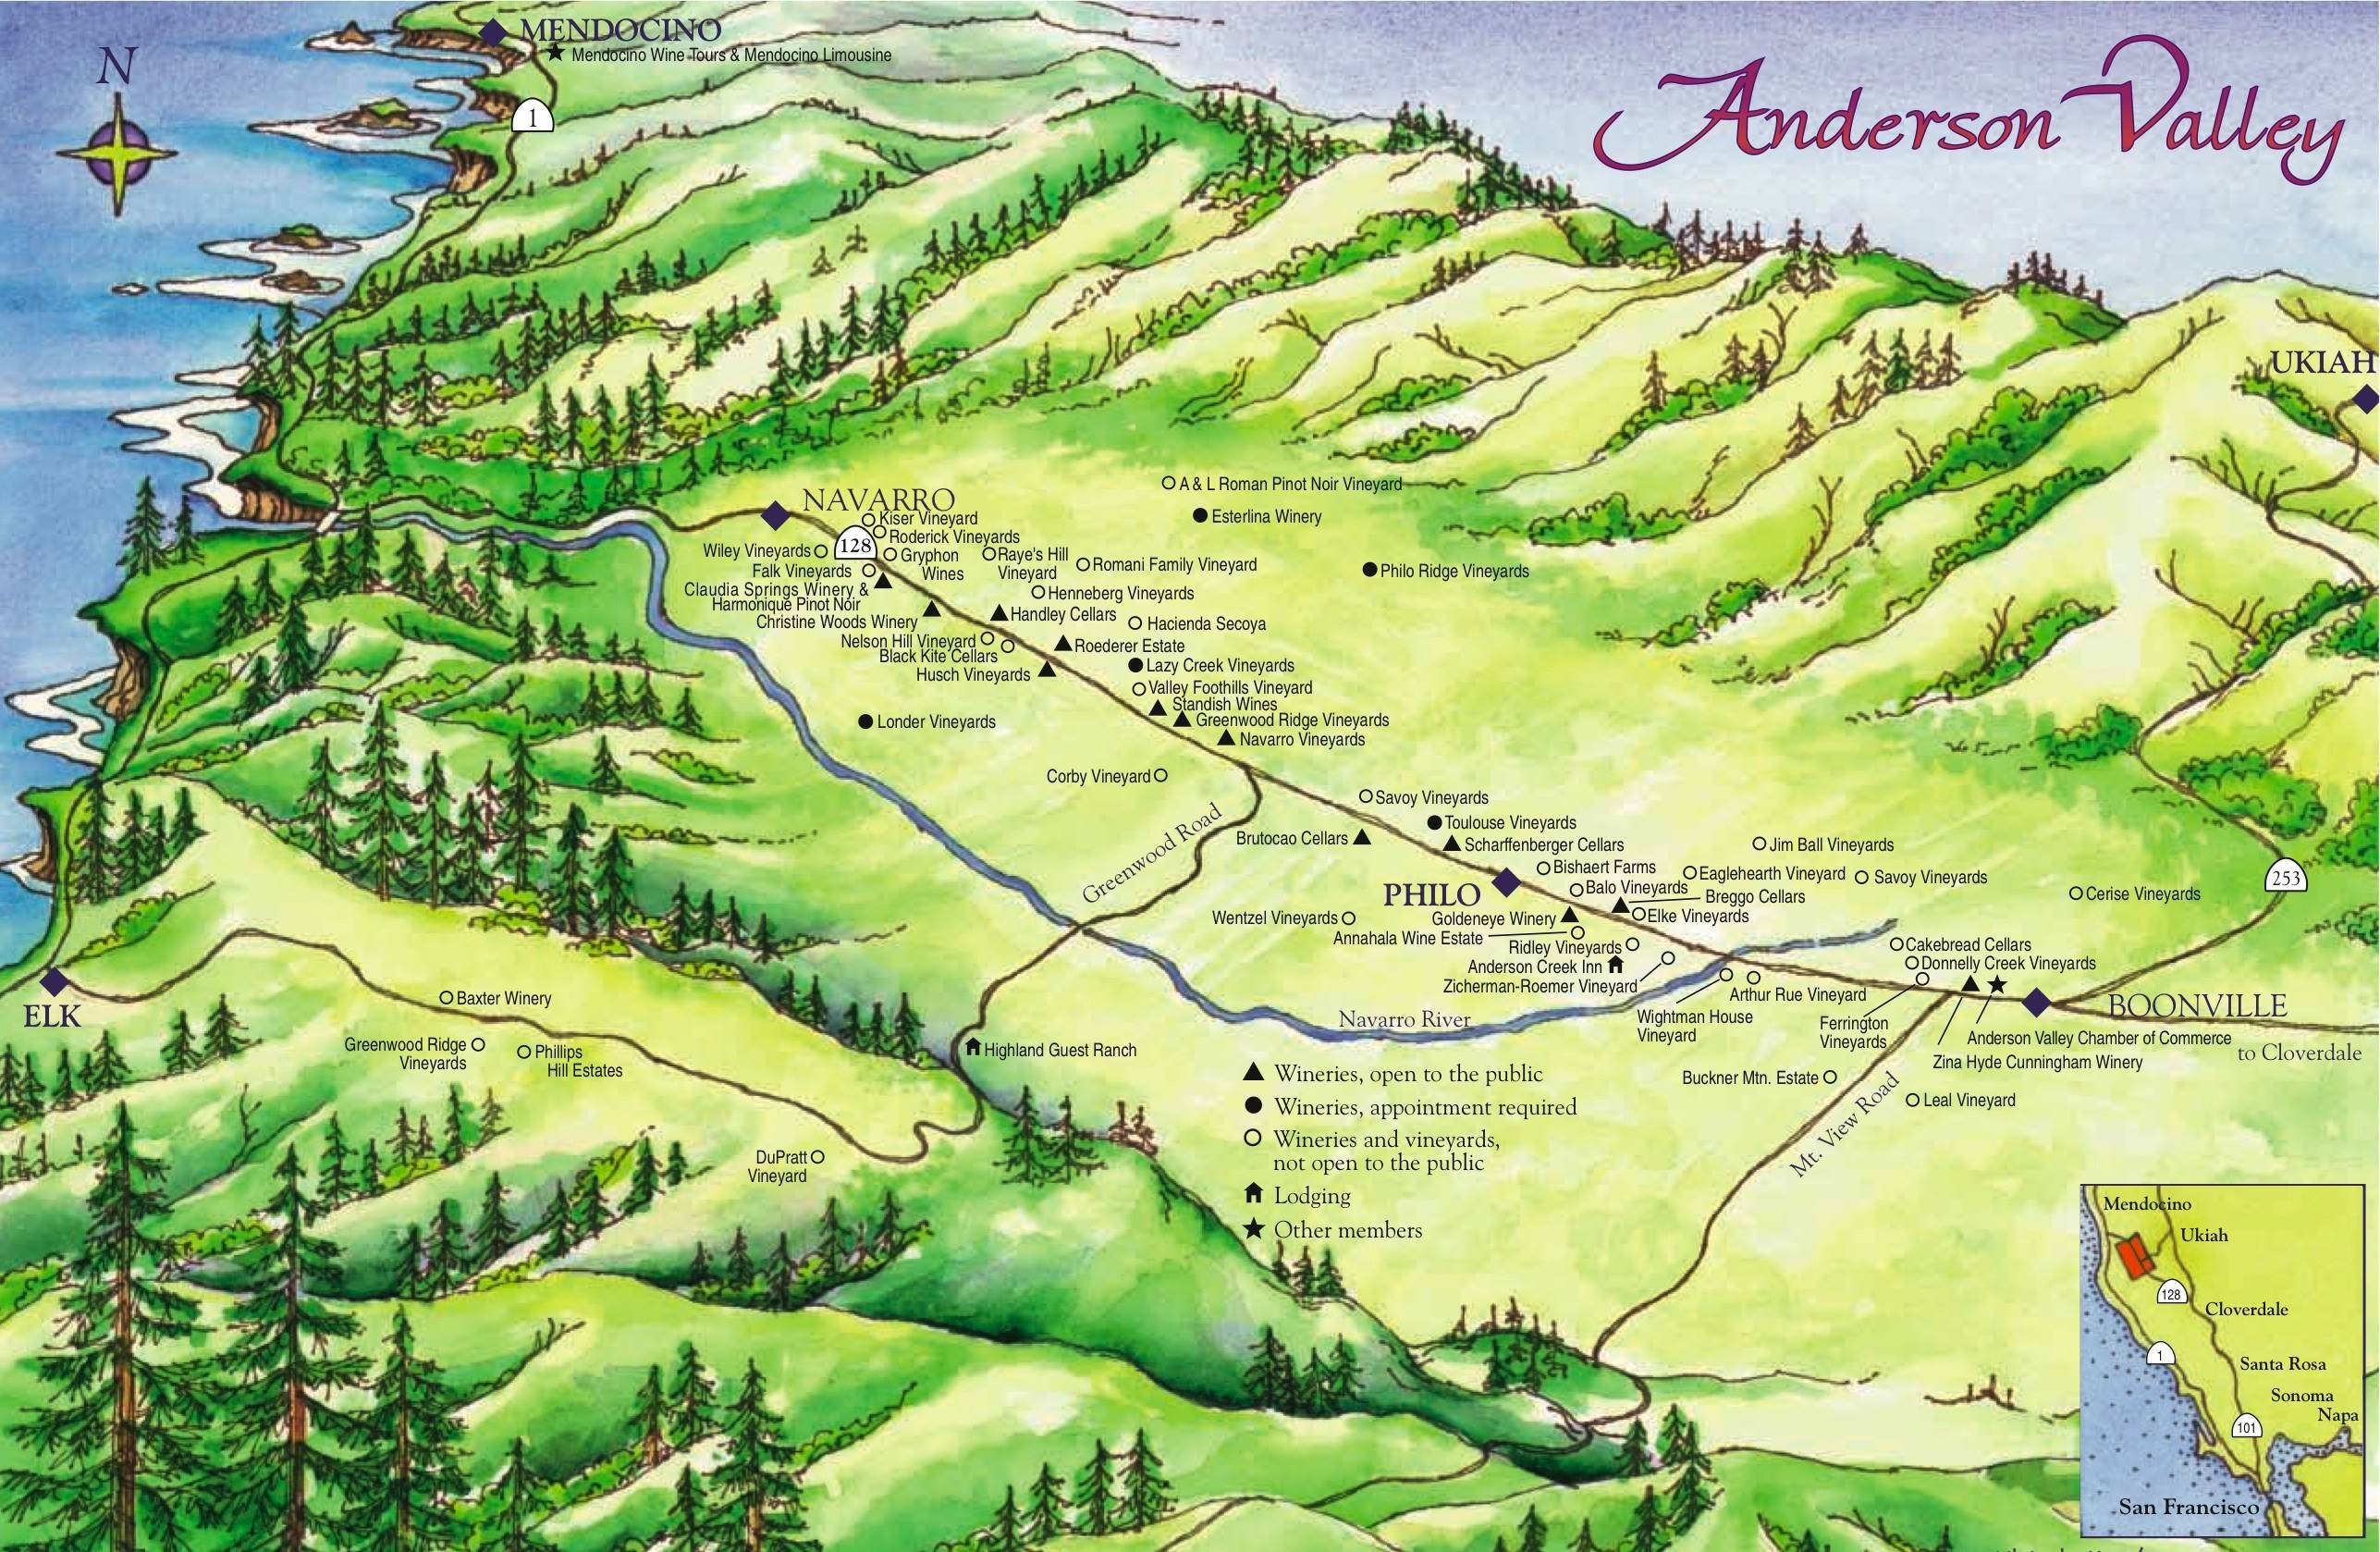 Anderson Valley Wine Map Philo California mappery